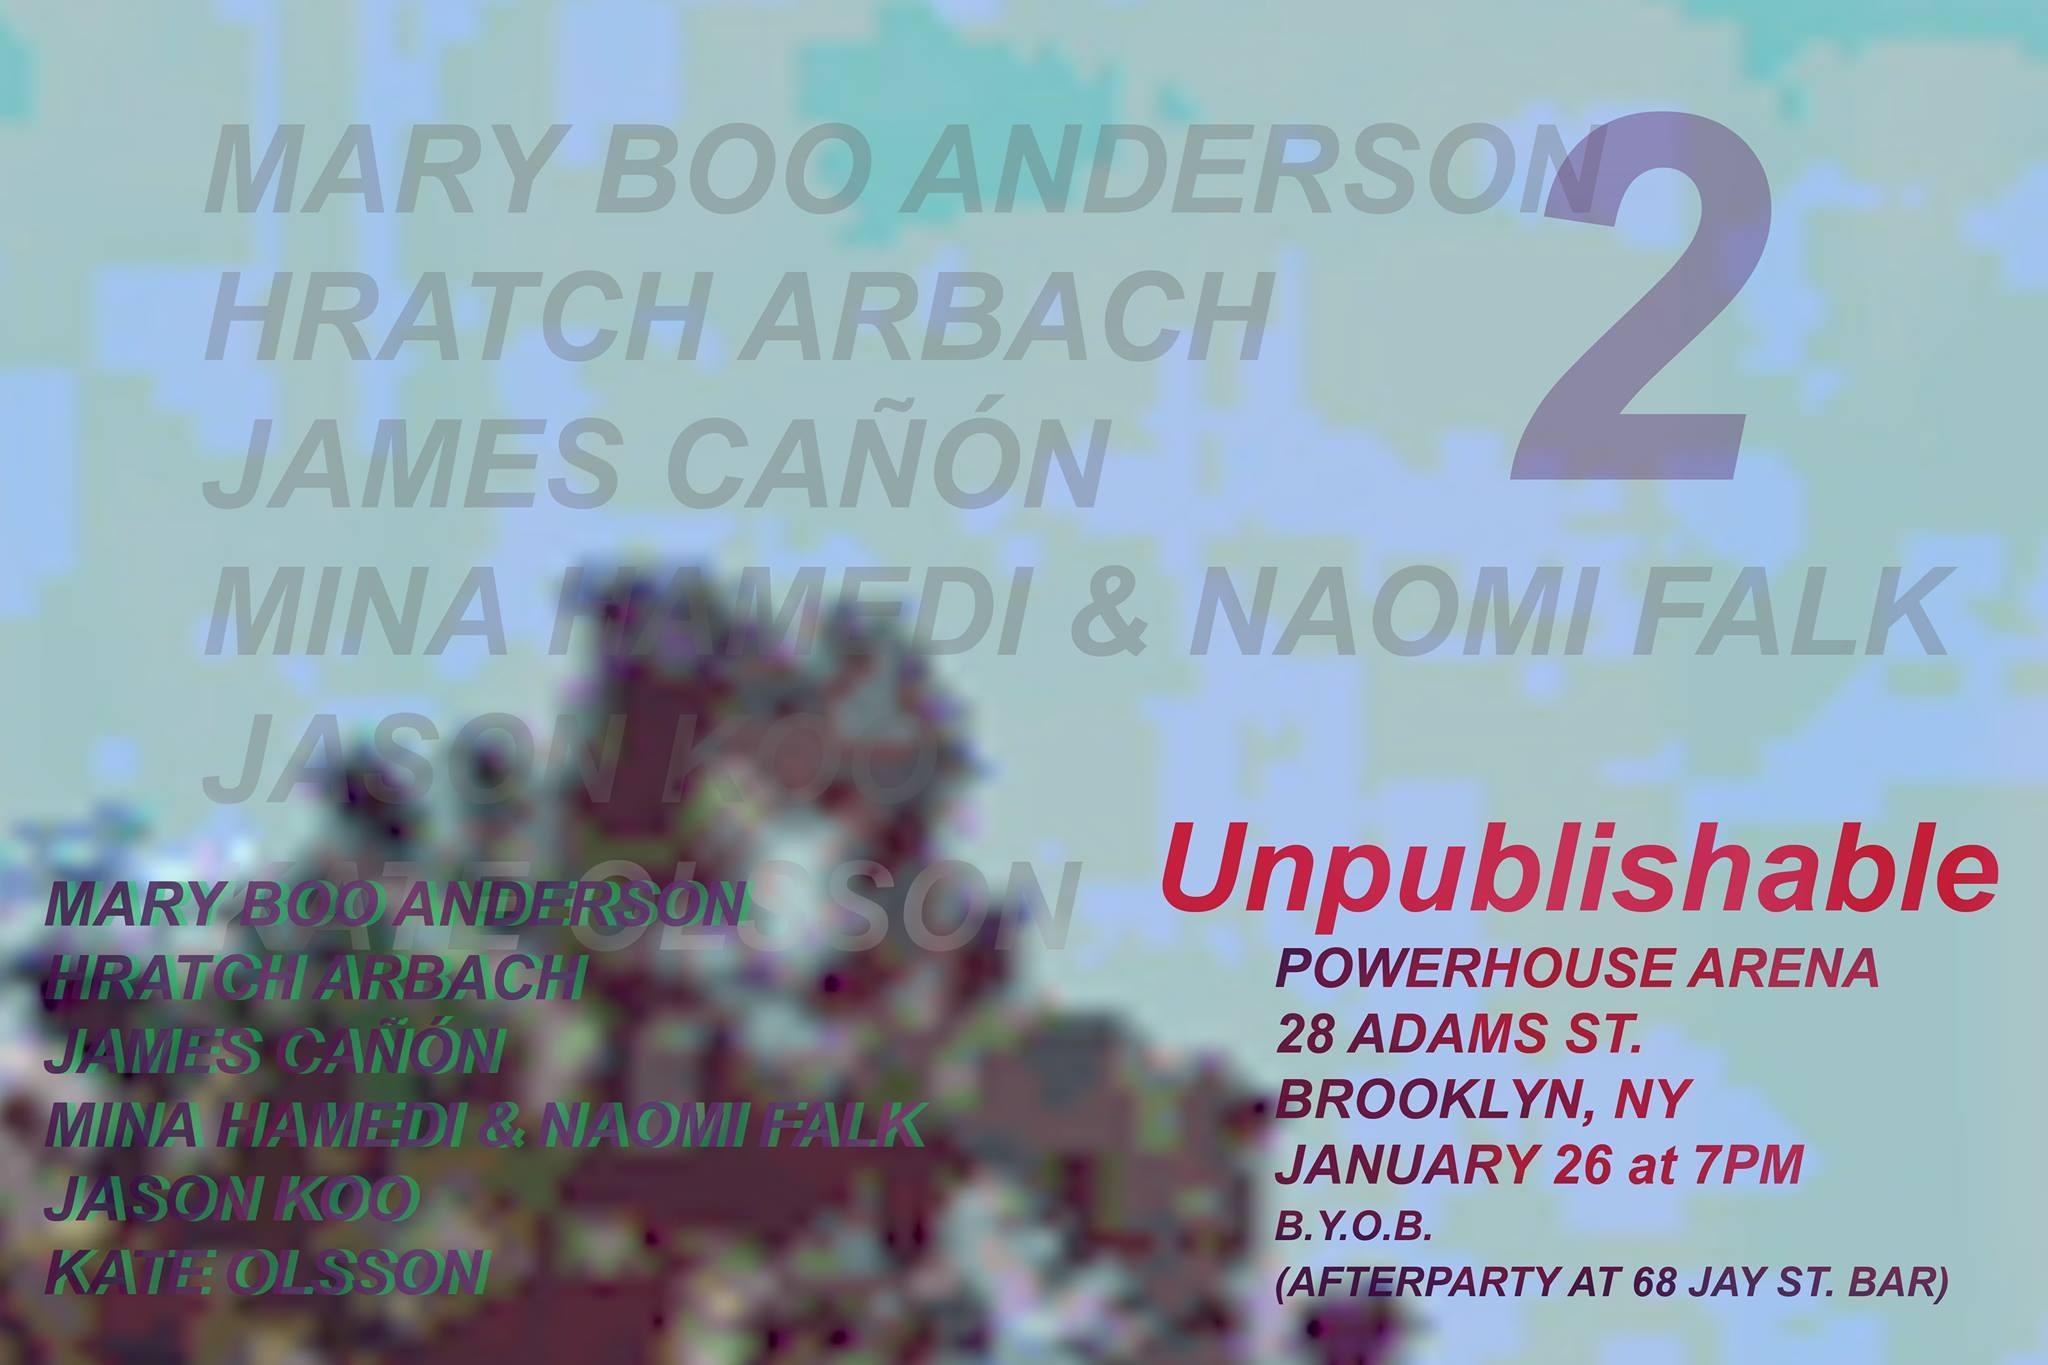 Reading: Unpublishable featuring Mary Boo Anderson, Hratch Arbach, James Cañón, Mina Hamedi & Naomi Falk, Jason Koo, Kate Olsson